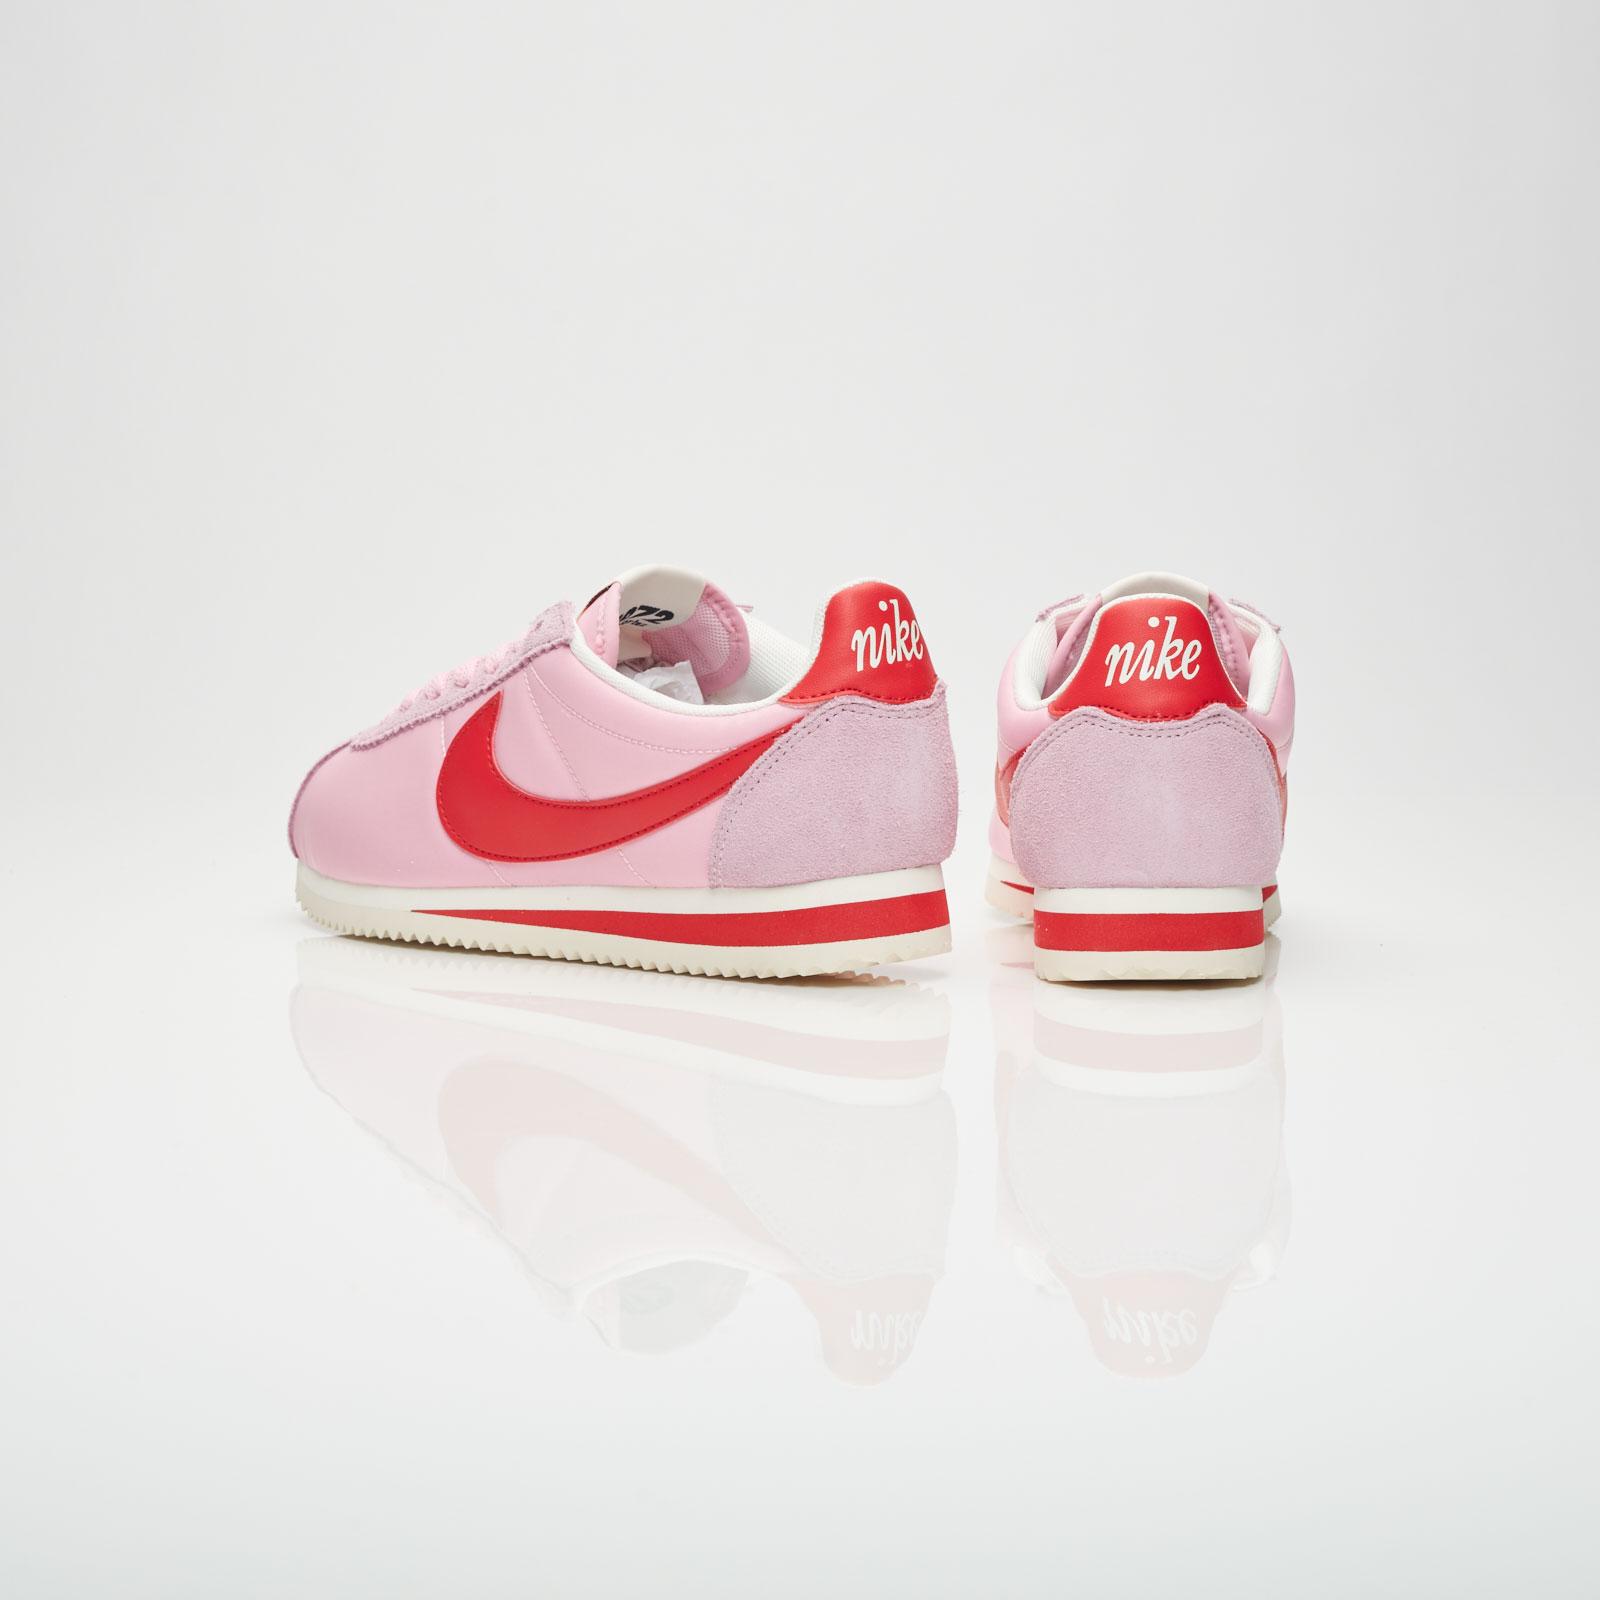 Nike Sportswear Wmns Classic Cortez Nylon Premium Nike Sportswear Wmns  Classic Cortez Nylon Premium ... 379cd6e76b